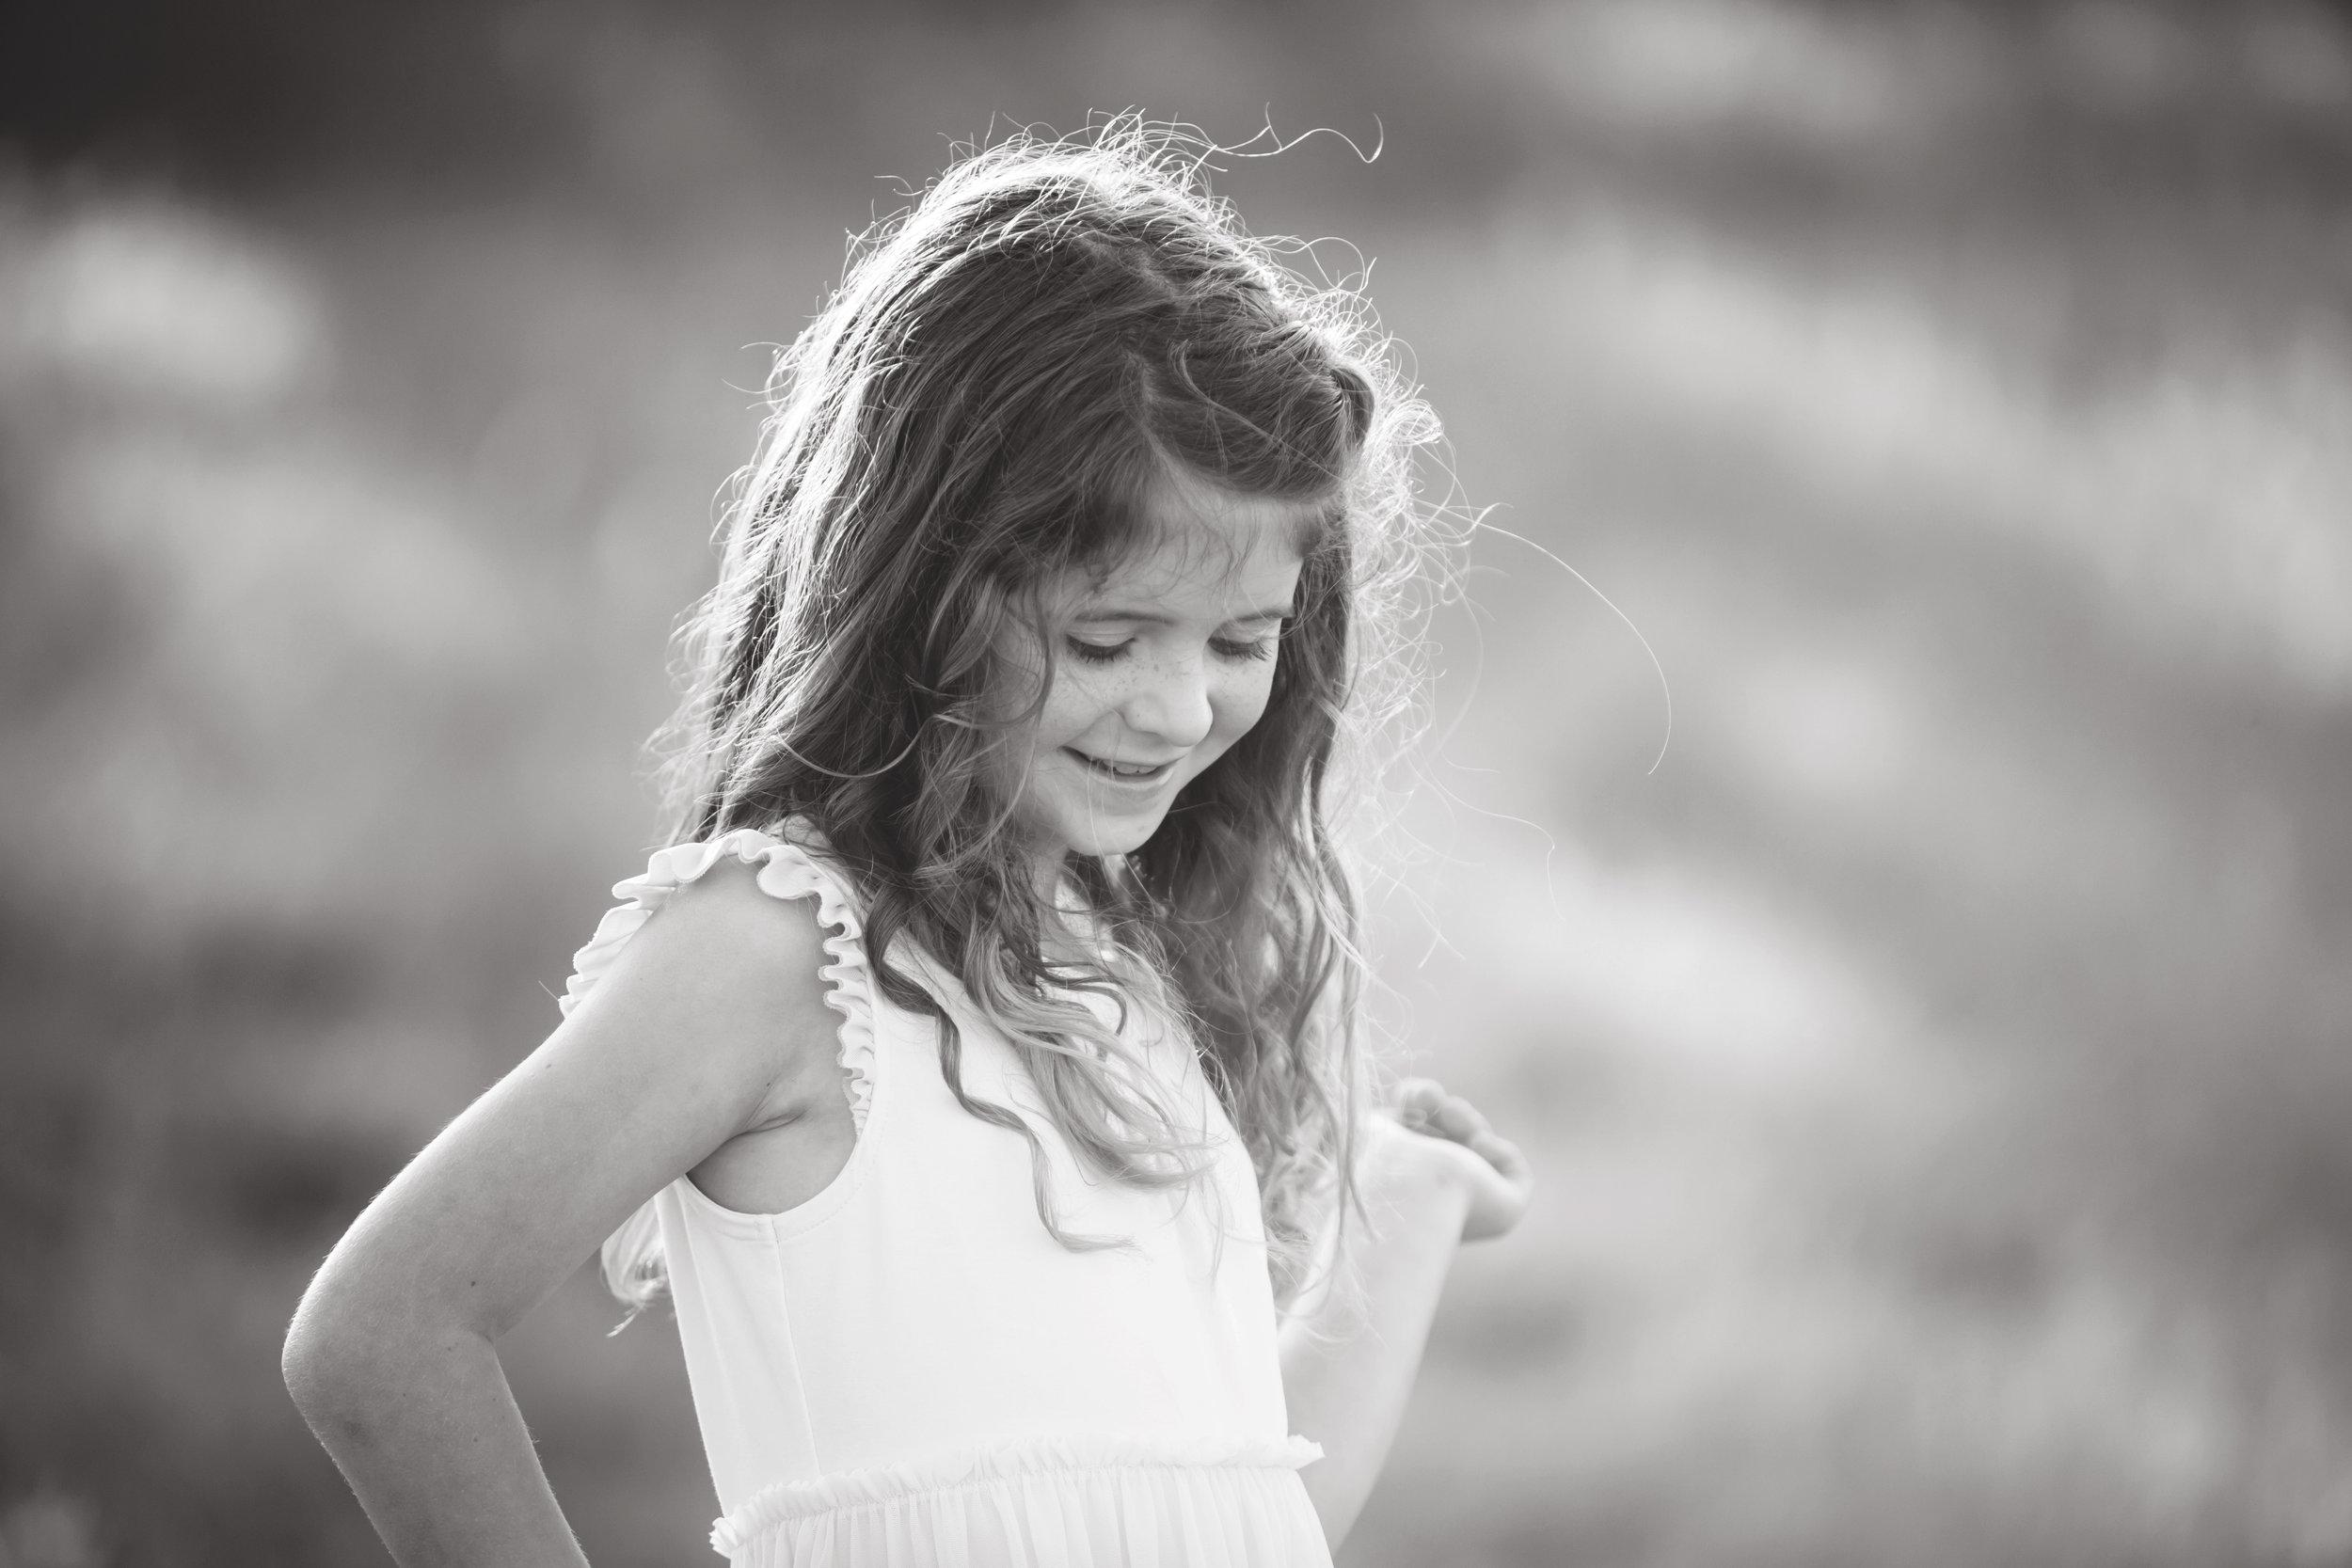 Marble_Falls_Horseshoe_Bay_Photographer_Turner_Family_12.jpg